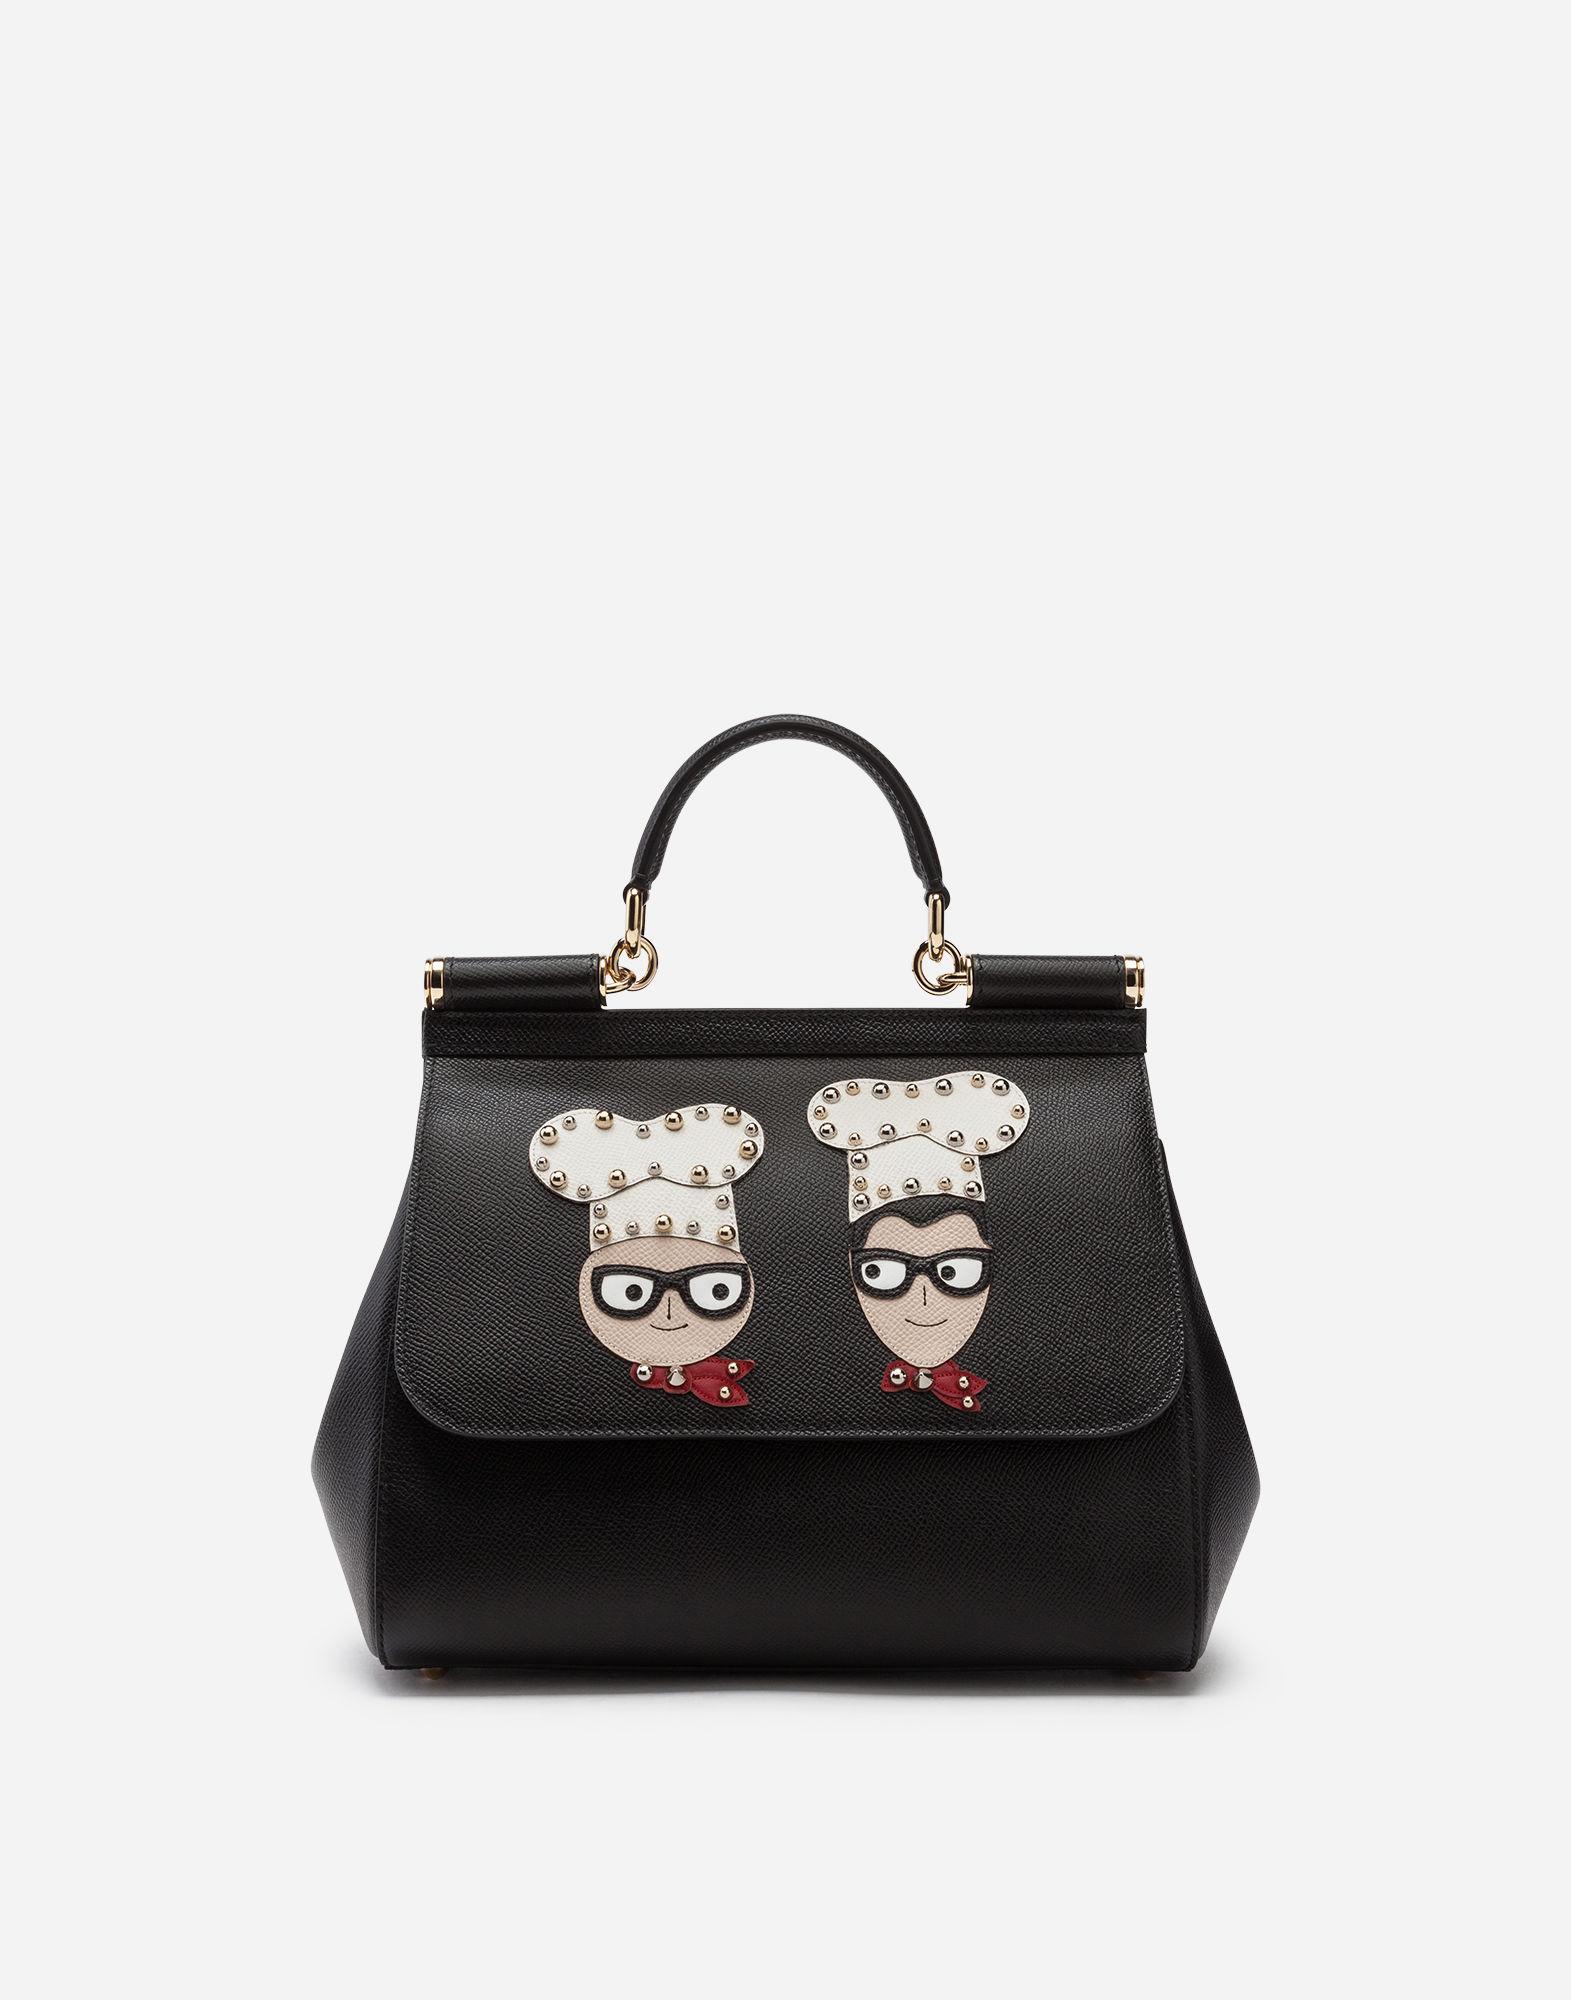 b36662d9f71a Lyst - Dolce   Gabbana Medium Sicily Handbag In Dauphine Calfskin ...